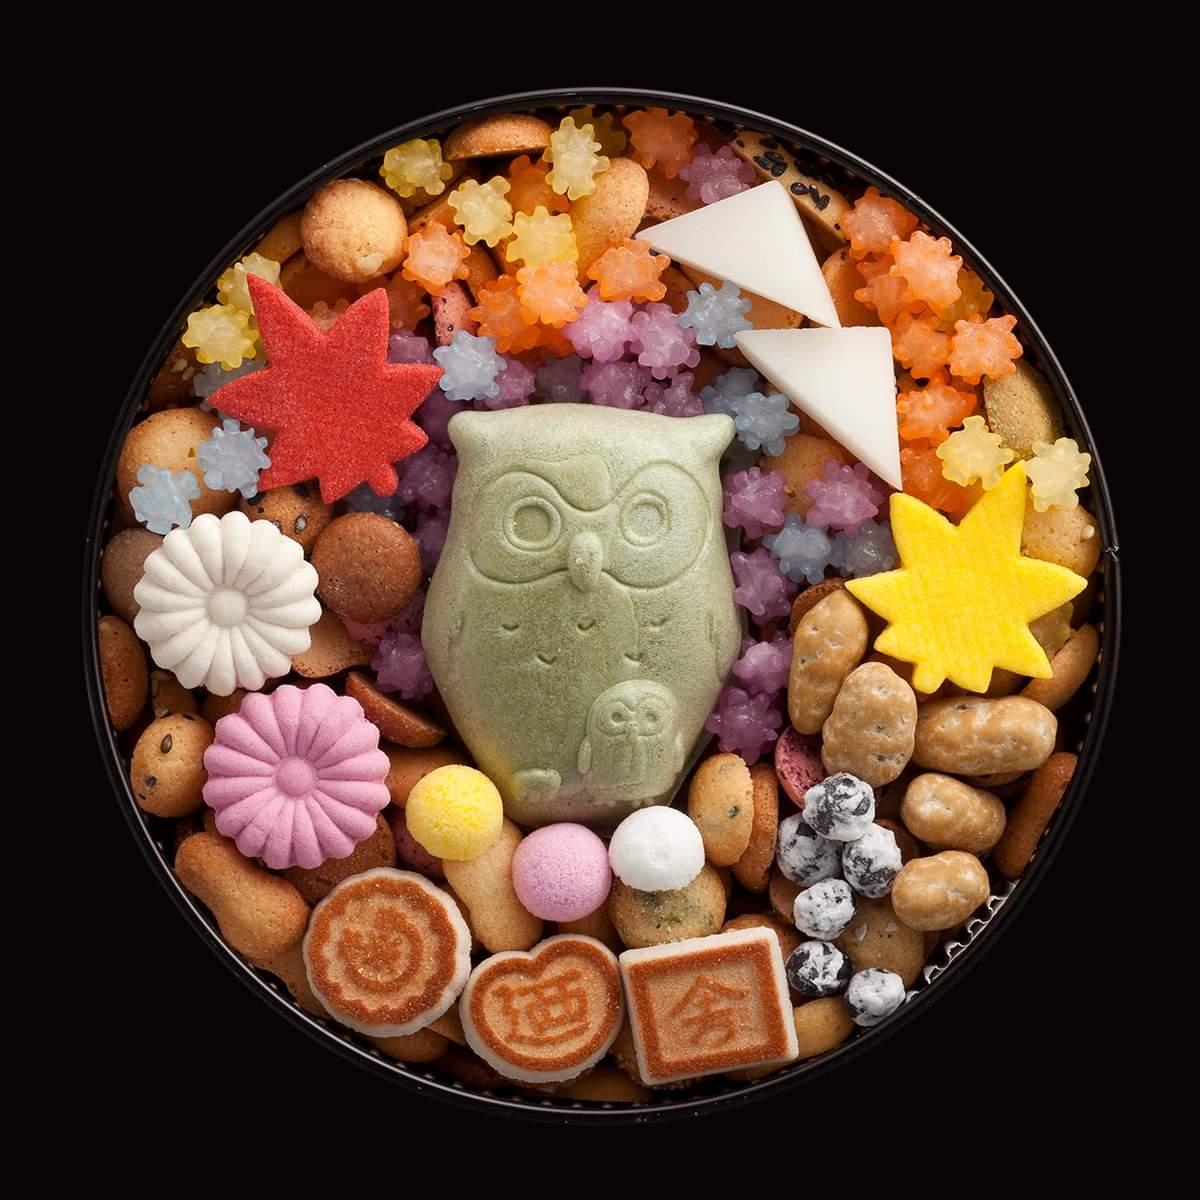 "test ツイッターメディア - #敬老の日 には冨貴寄を🎁🦉 銀座 菊廼舎本店 登録商標 冨貴寄 ふくろう 明治23年創業。茶事には欠かせないお菓子、冨貴寄。職人が丁寧に作った小さくてかわいらしい江戸和菓子が缶にぎっしり!ふくろうは""福老""とも書く縁起のいい生き物。 福寿を願い、ふくろうの中に8つの幸せを入り https://t.co/715dFKXefn"